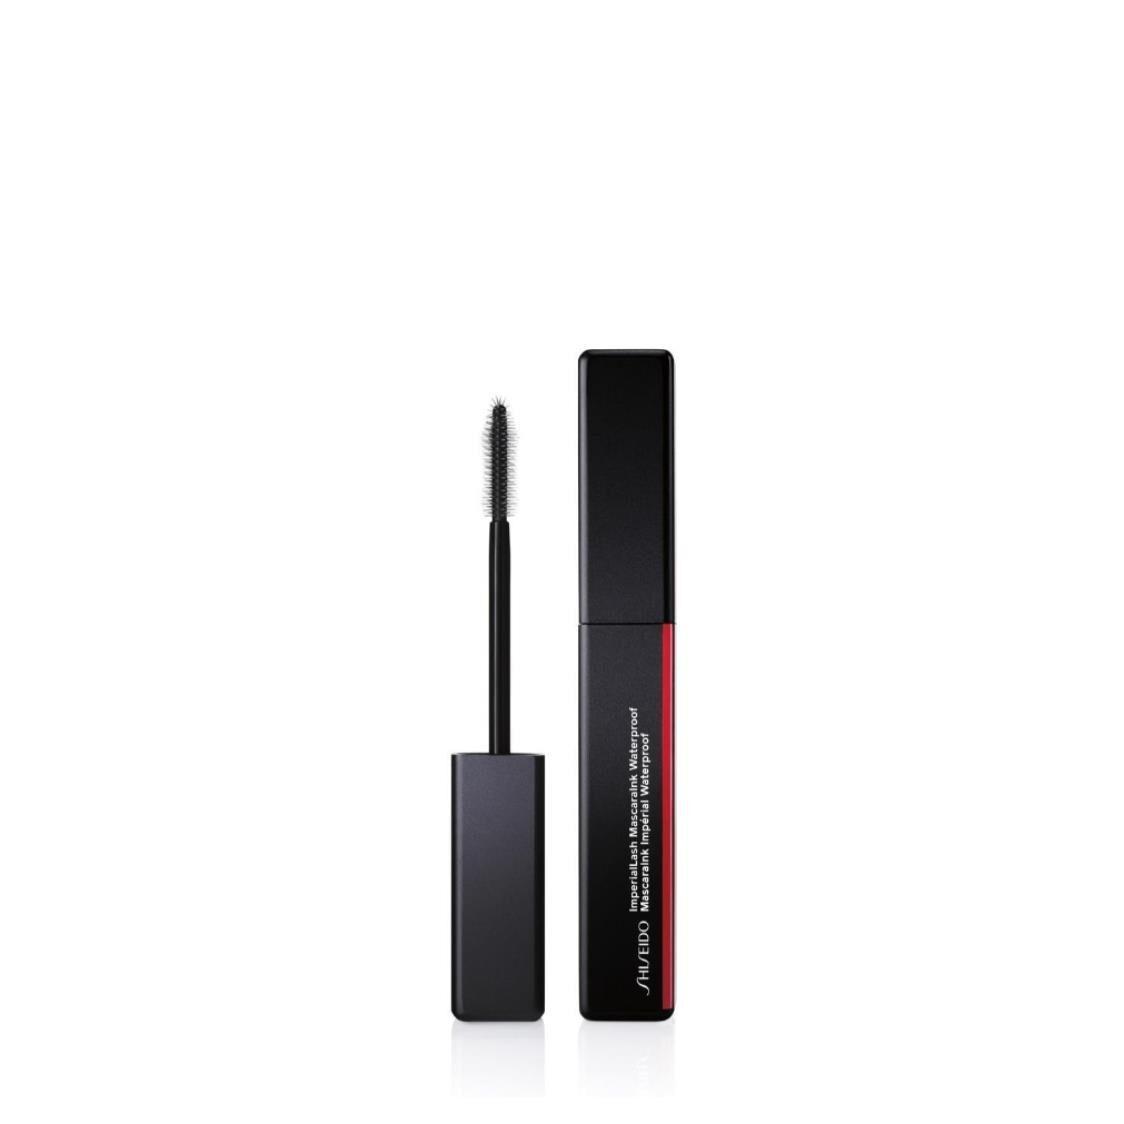 Shiseido Makeup ImperialLash MascaraInk Waterproof 01 Sumi Black